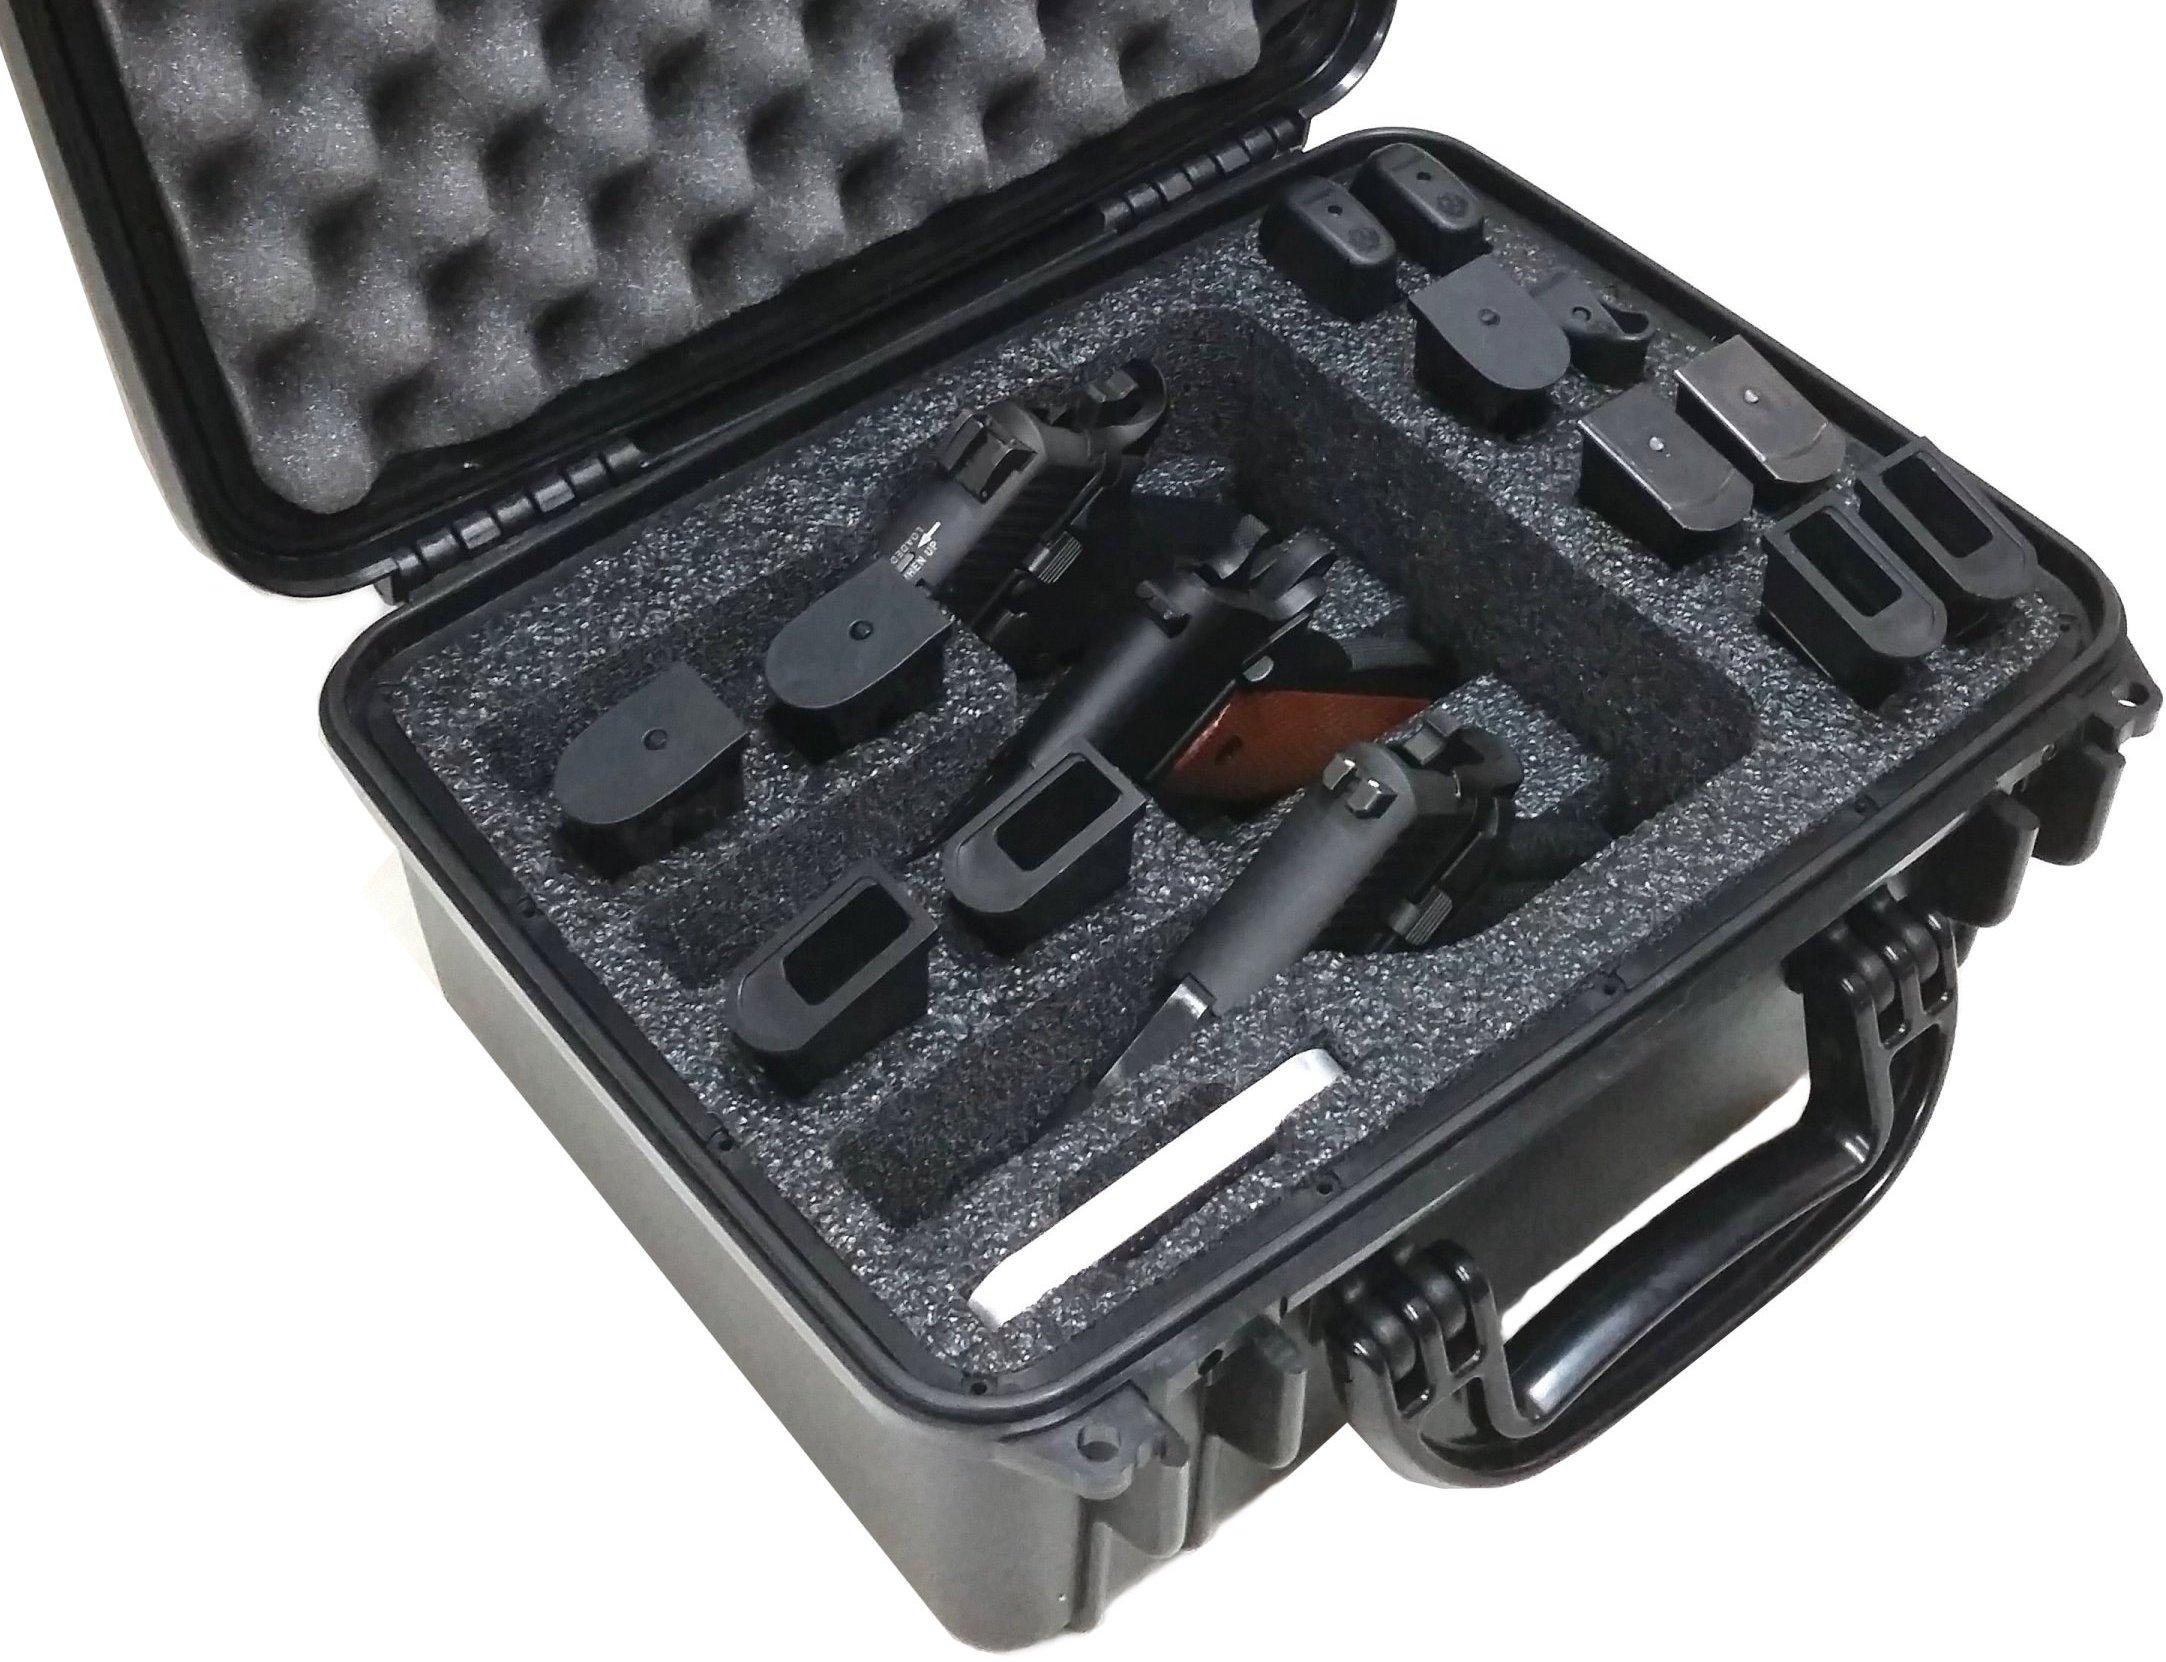 Seahorse 520 Case Custom Foam Example: 3 Pistol Case